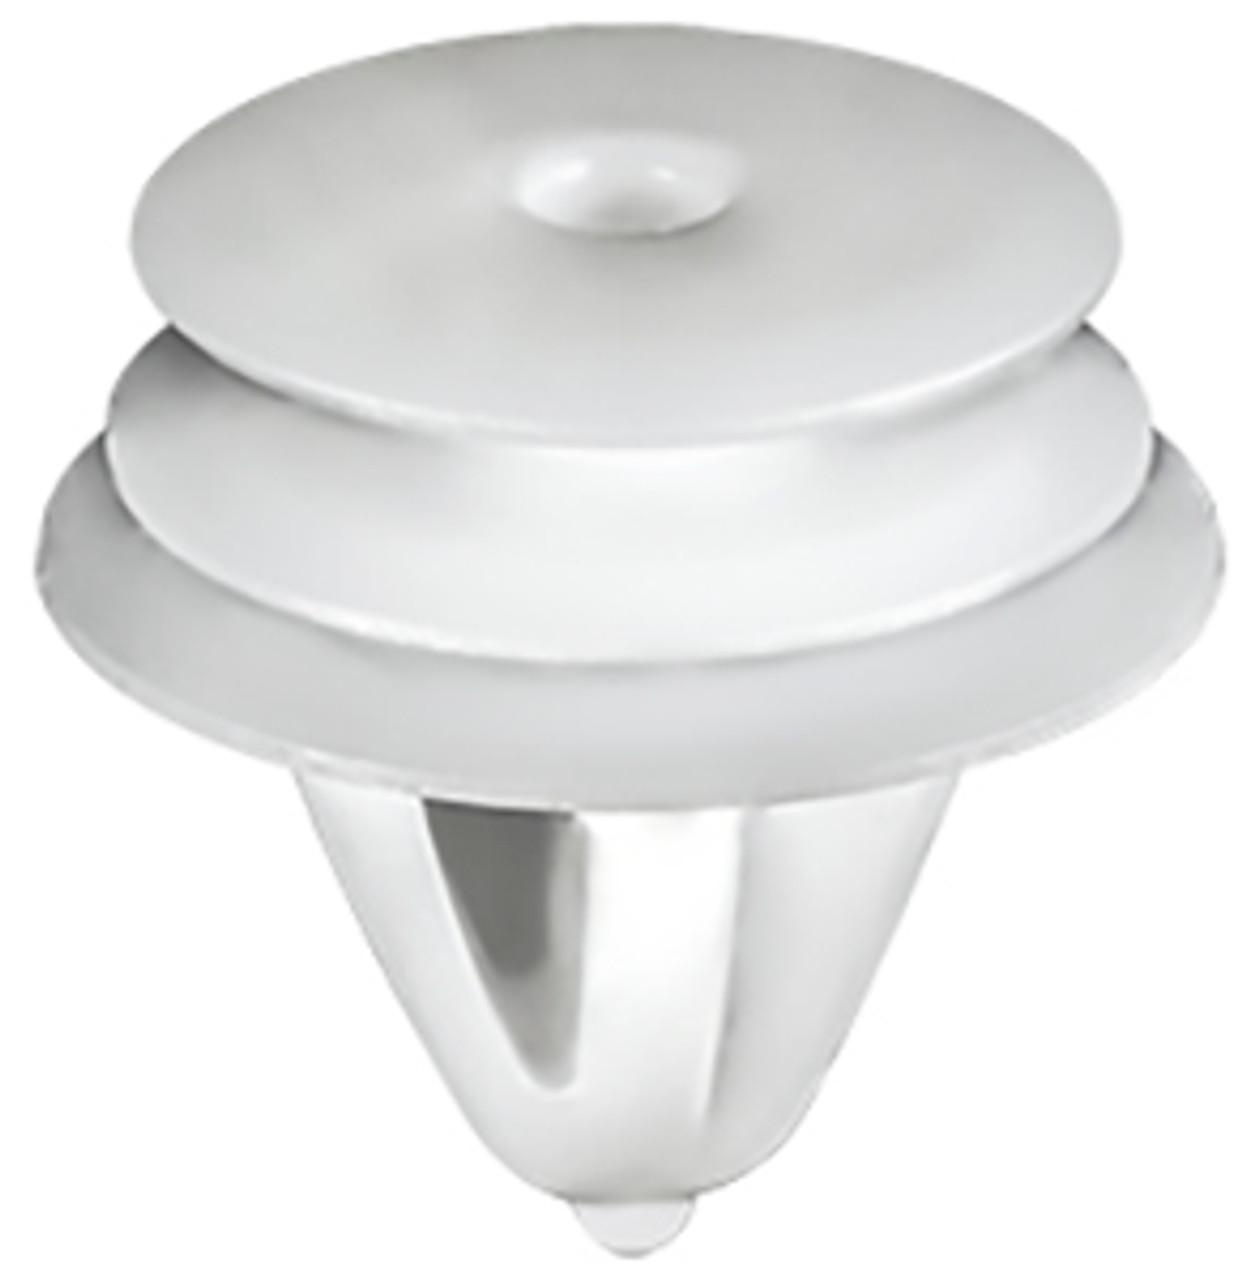 Trim Panel Retainer White Nylon Top Head diameter: 15mm Middle Head Diameter: 16mm Bottom Head Diameter: 18mm Stem Diameter: 10.7mm Stem Length: 12mm Hyundai & Kia 1995 - On OEM# 82315-33020 50 Per Box